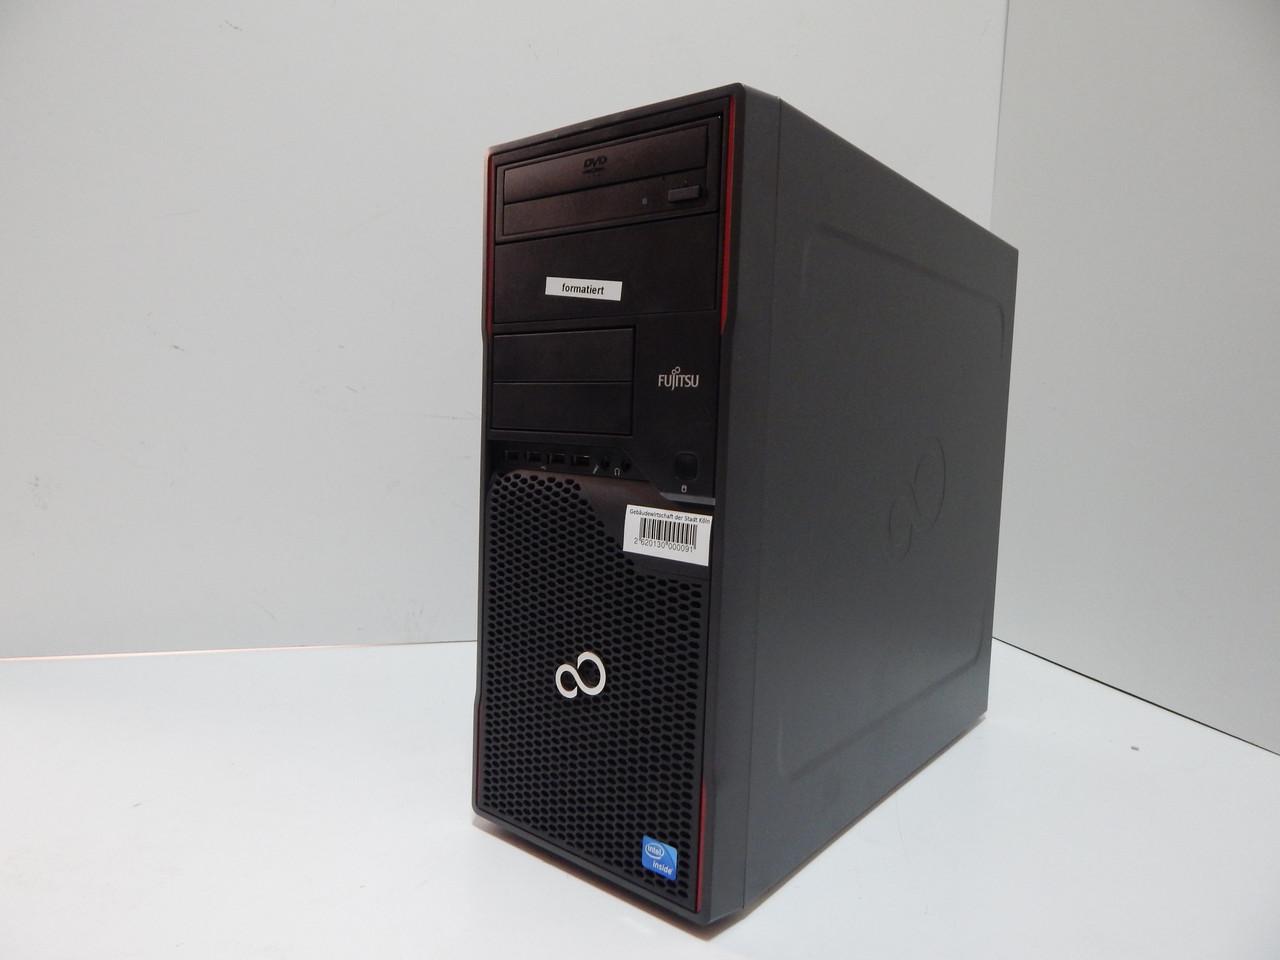 Системный блок Fujitsu Esprimo P710 E85+ Tower i5-3470, 4GB RAM, socket 1155